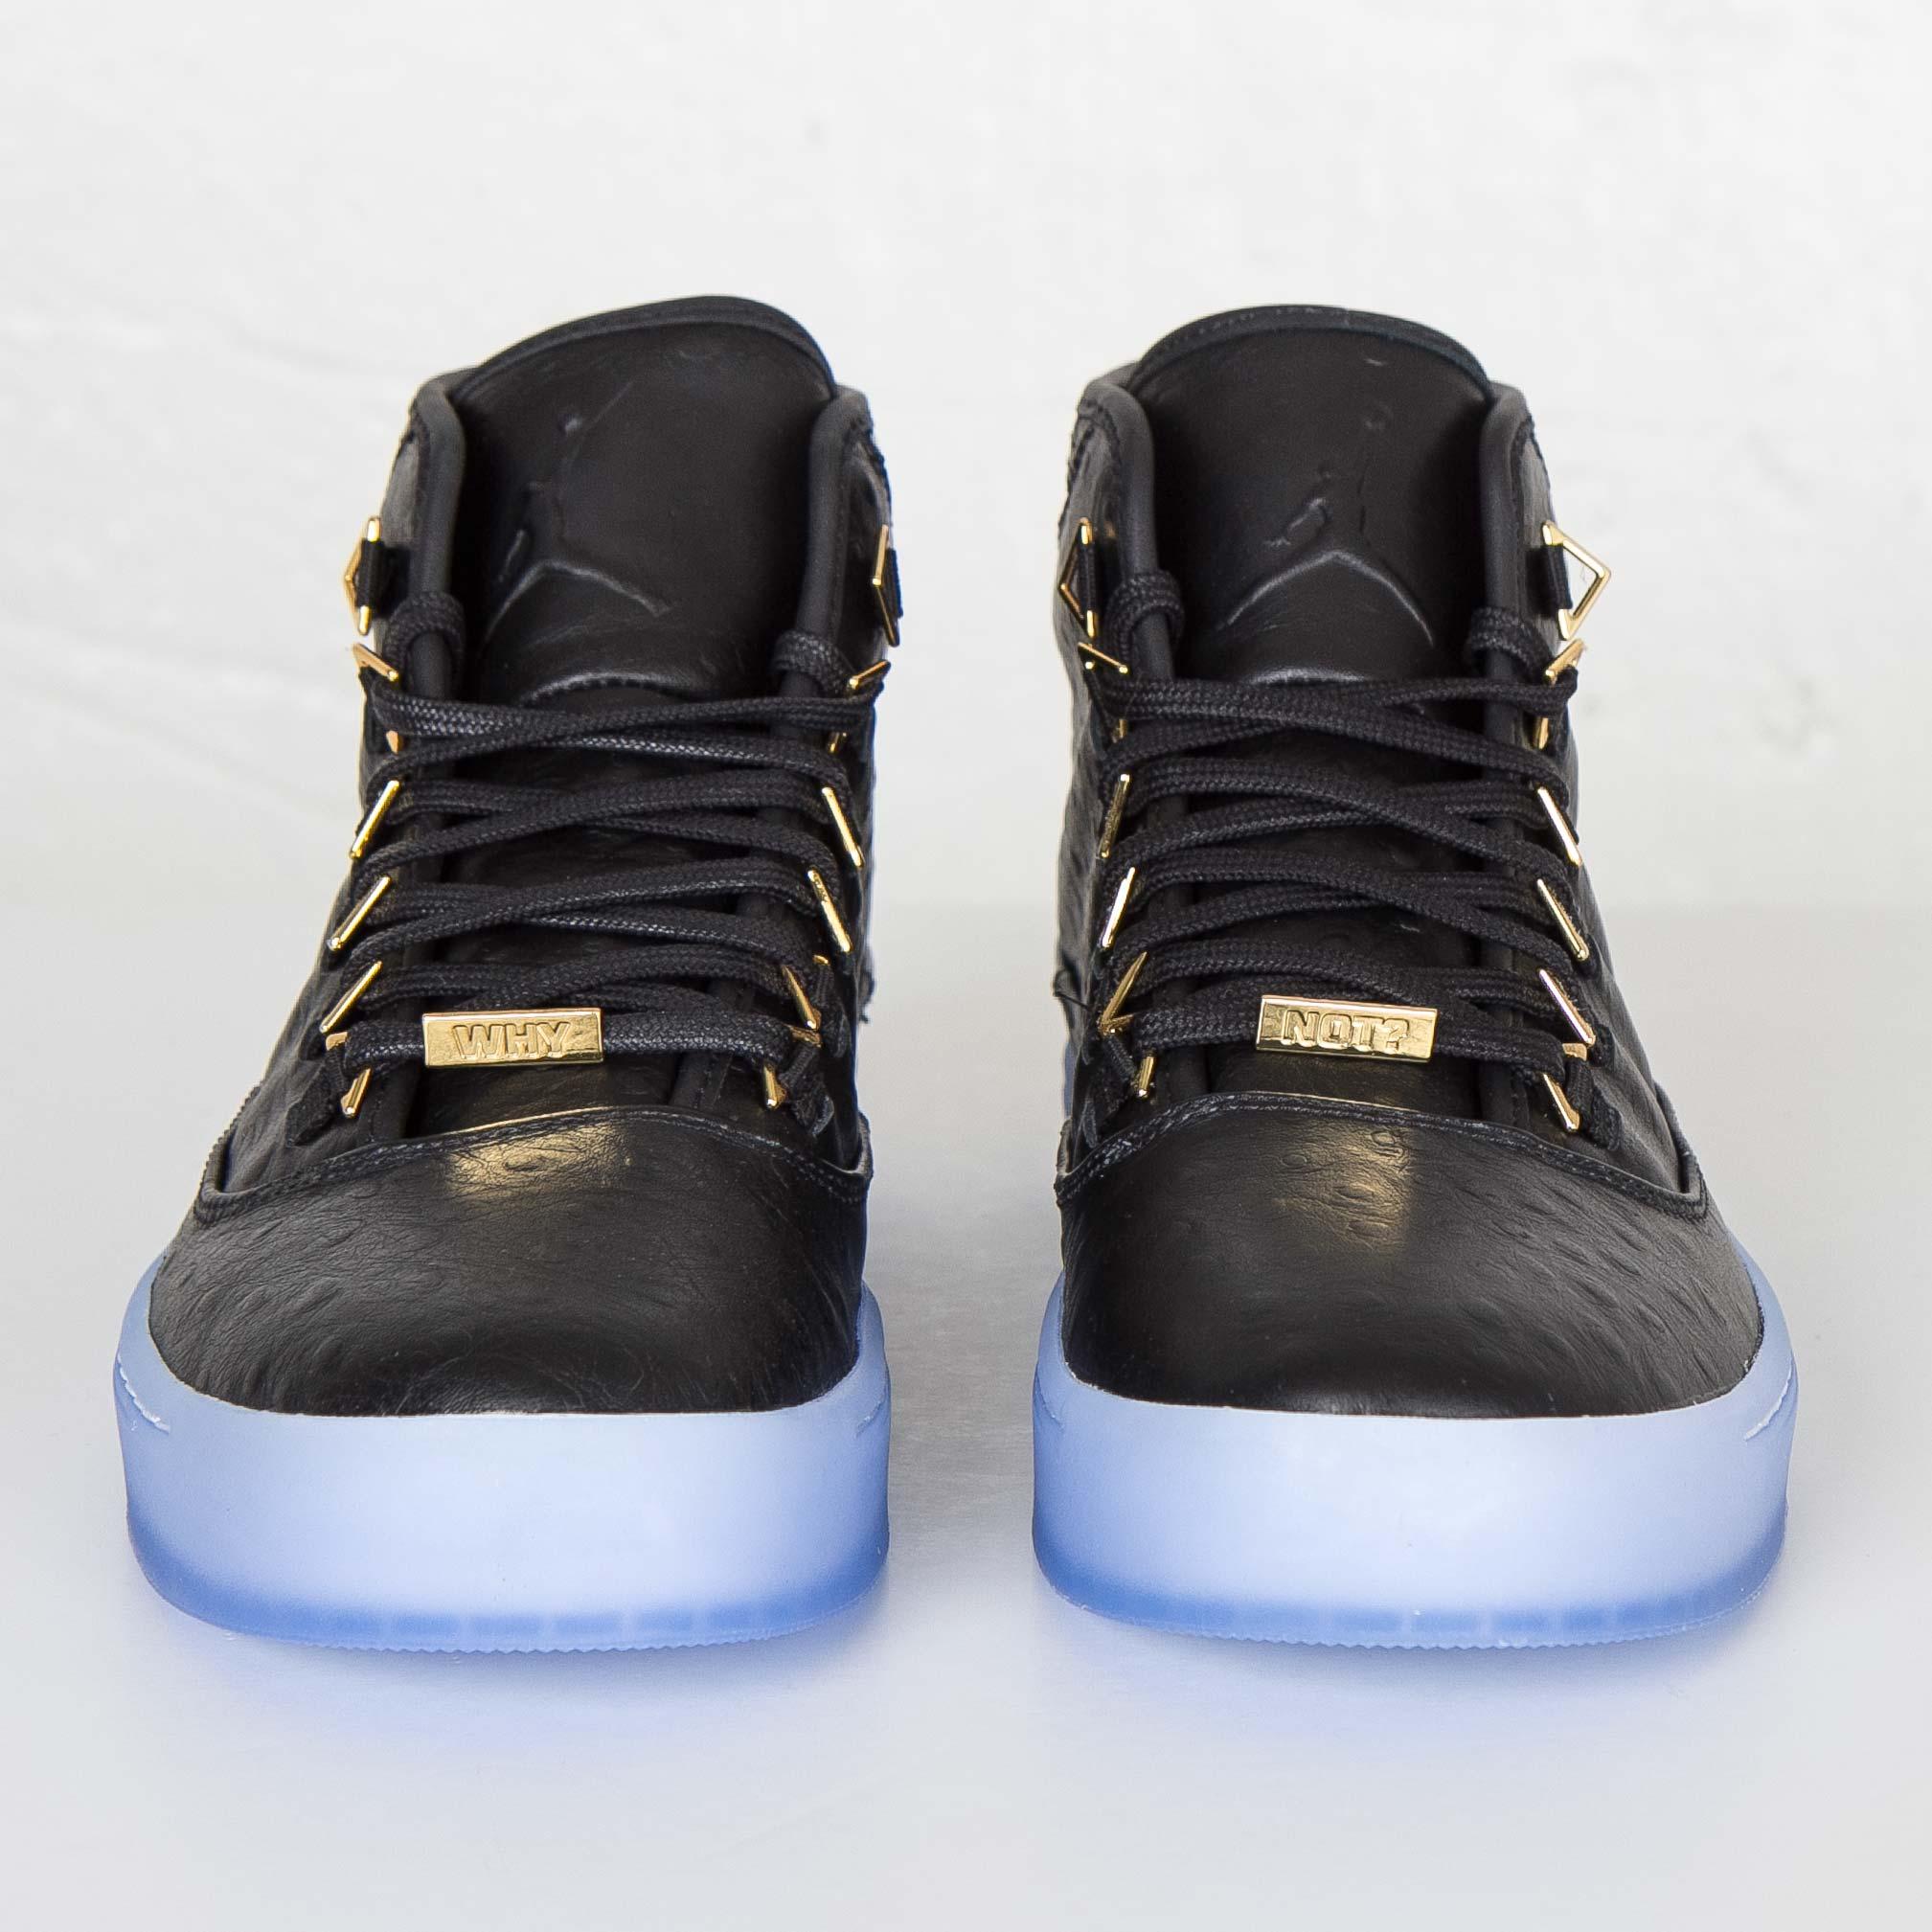 check out 5b2a5 a145b Jordan Brand Jordan Westbrook 0 Premium - 838817-035 - Sneakersnstuff    sneakers   streetwear online since 1999